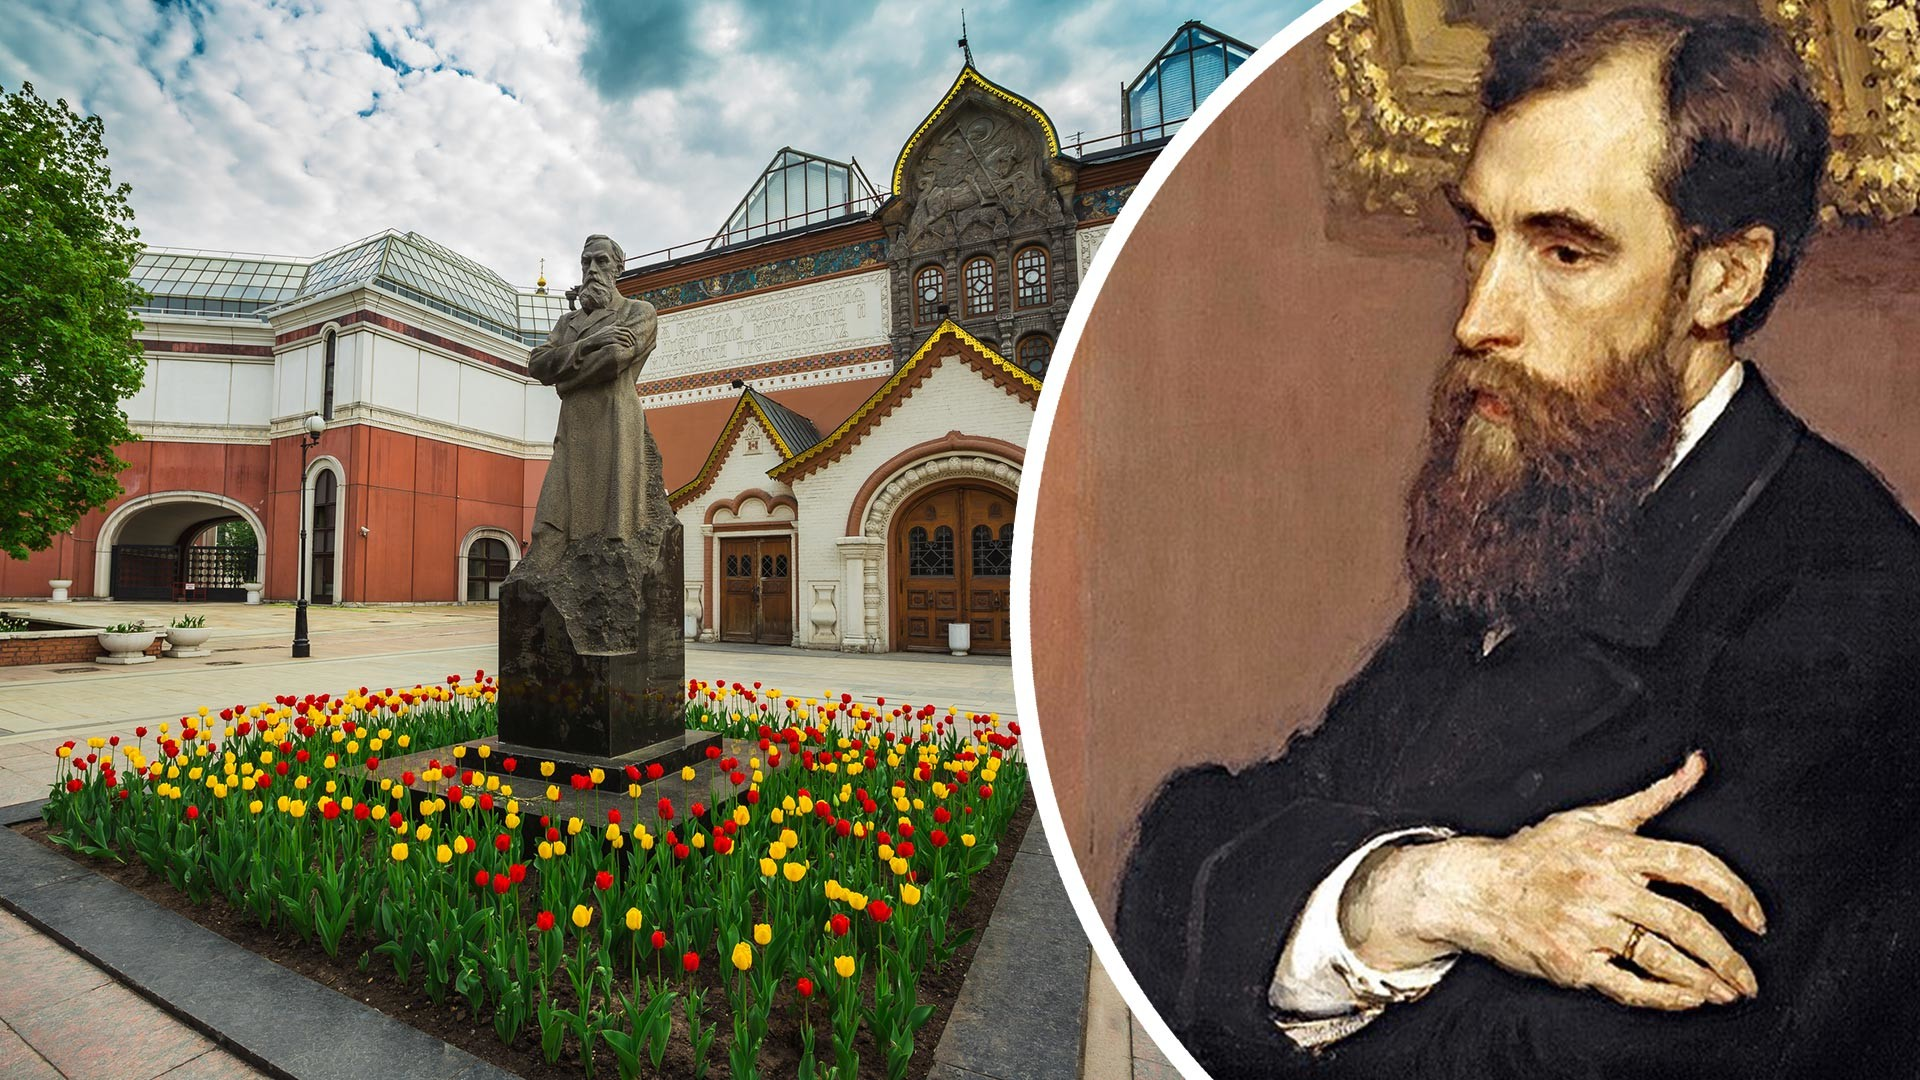 Monument to Pavel Tretyakov in front of the gallery; Portrait of Pavel Tretyakov by Ilya Repin